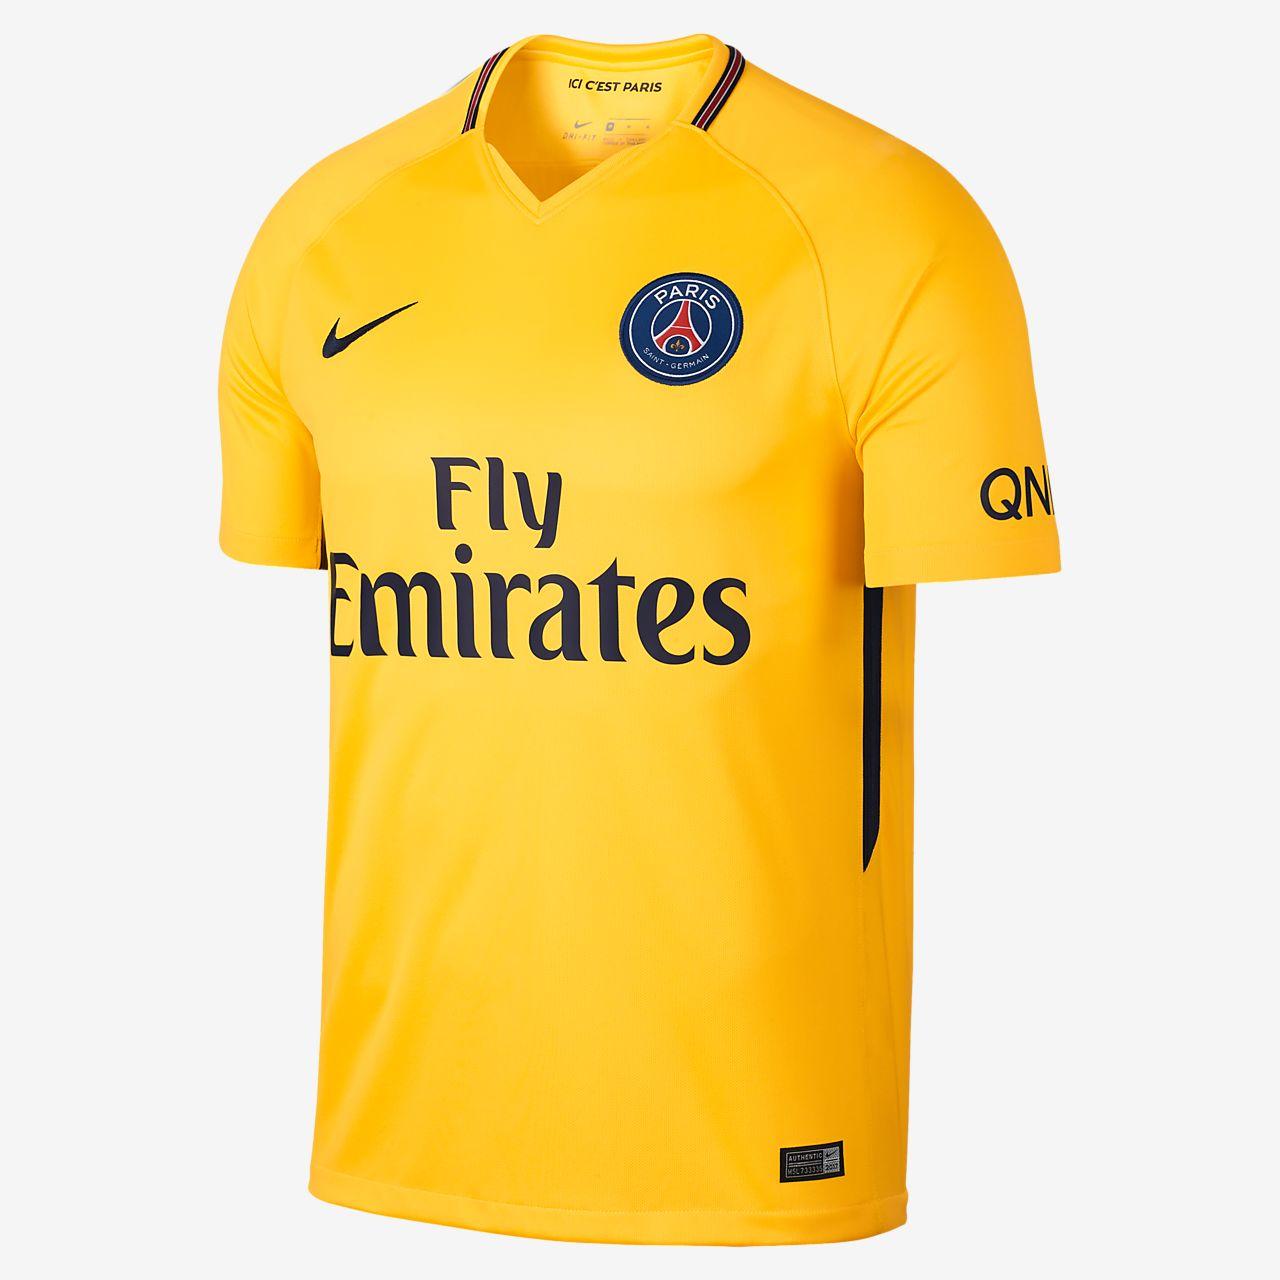 937b977566 ... Camiseta de fútbol para hombre de visitante Stadium del Paris Saint-Germain  2017 18